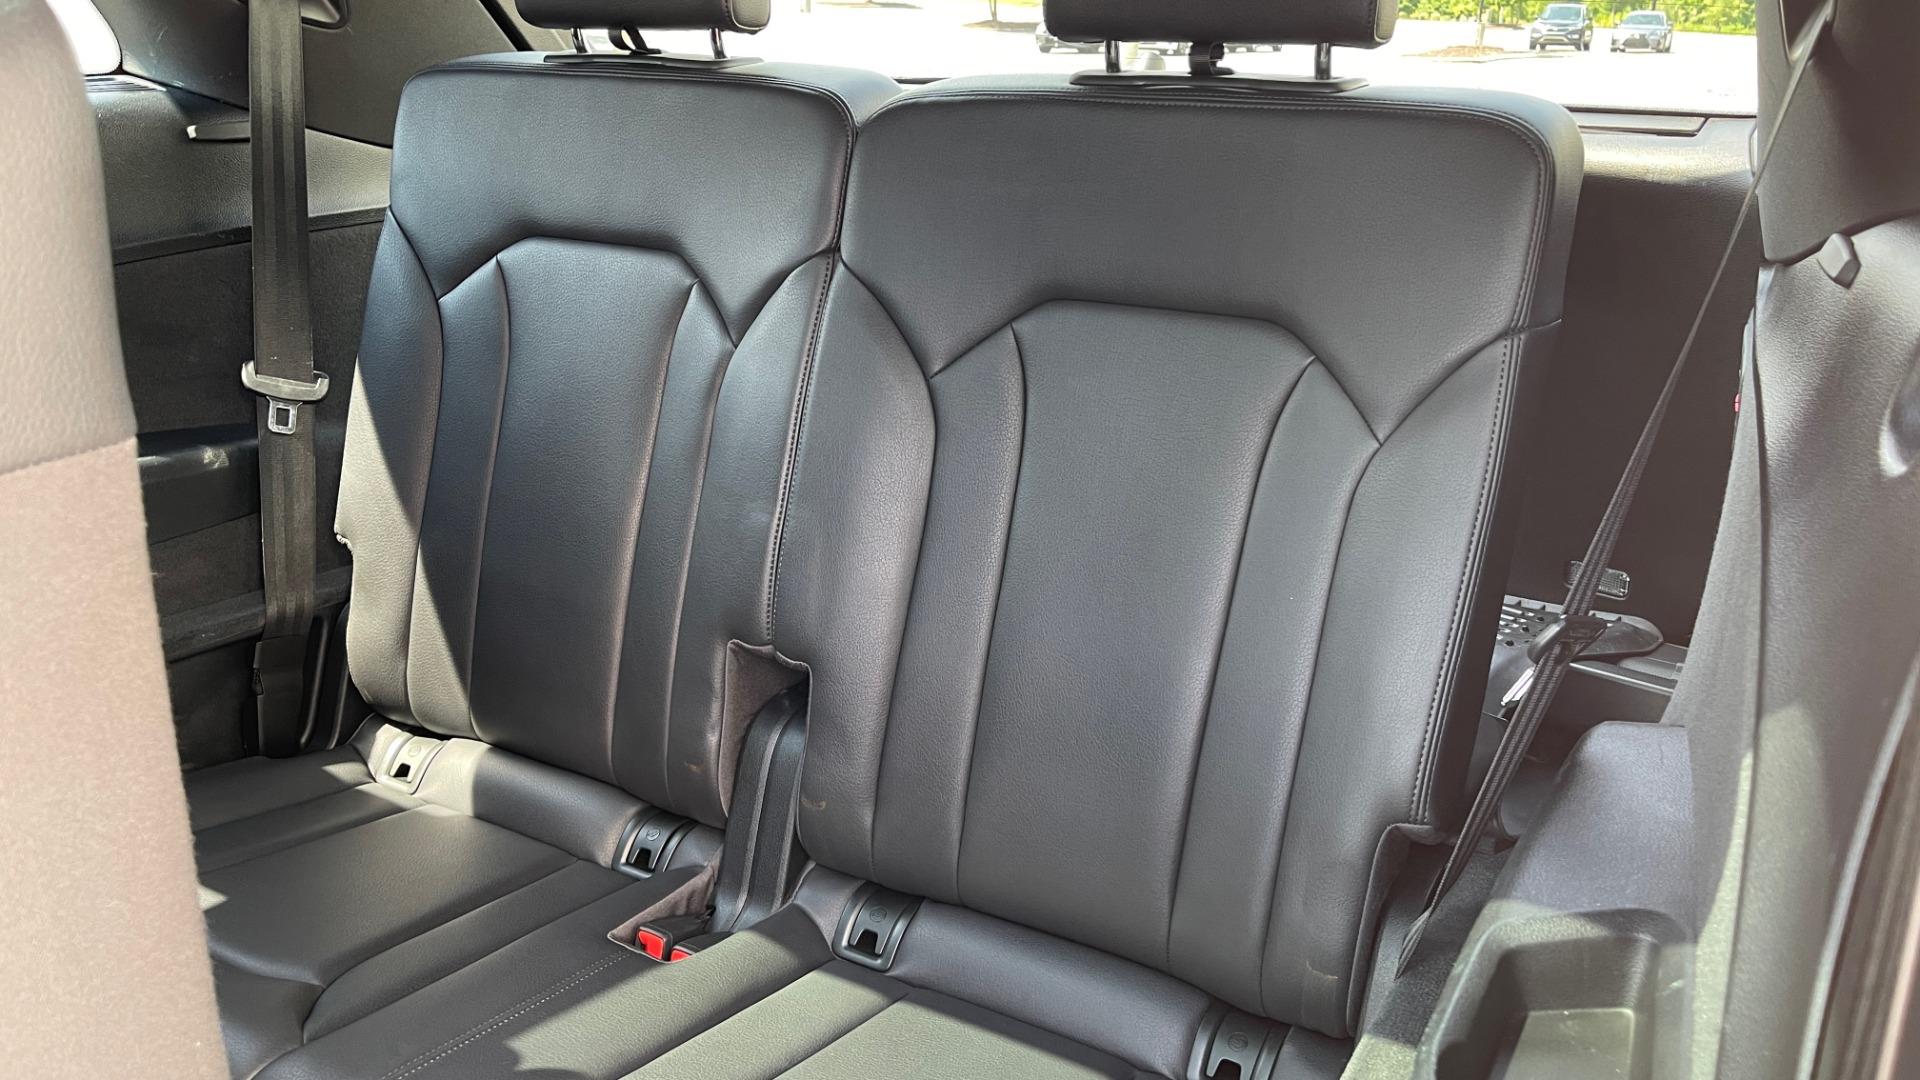 Used 2018 Audi Q7 PRESTIGE TIPTRONIC / NAV / SUNROOF / ADAPTIVE PKG / DRVR ASST / CLD WTHR /  for sale $49,995 at Formula Imports in Charlotte NC 28227 66